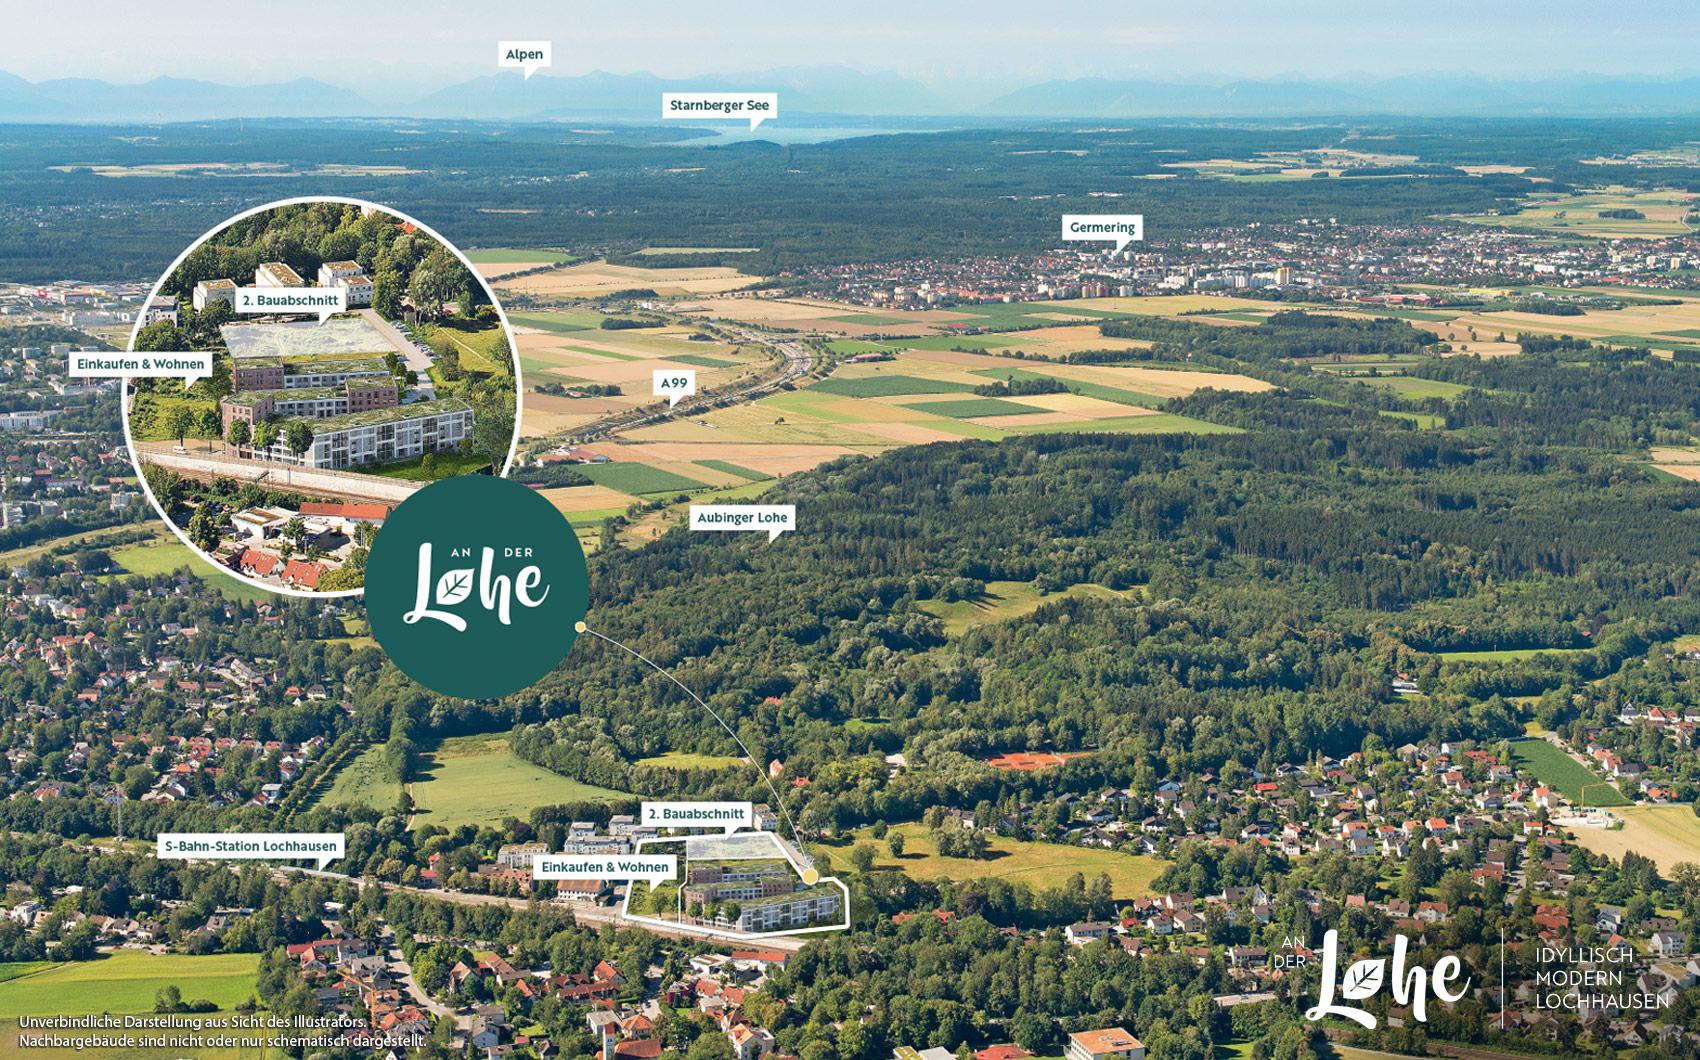 Immobilie An der Lohe - Luftbild